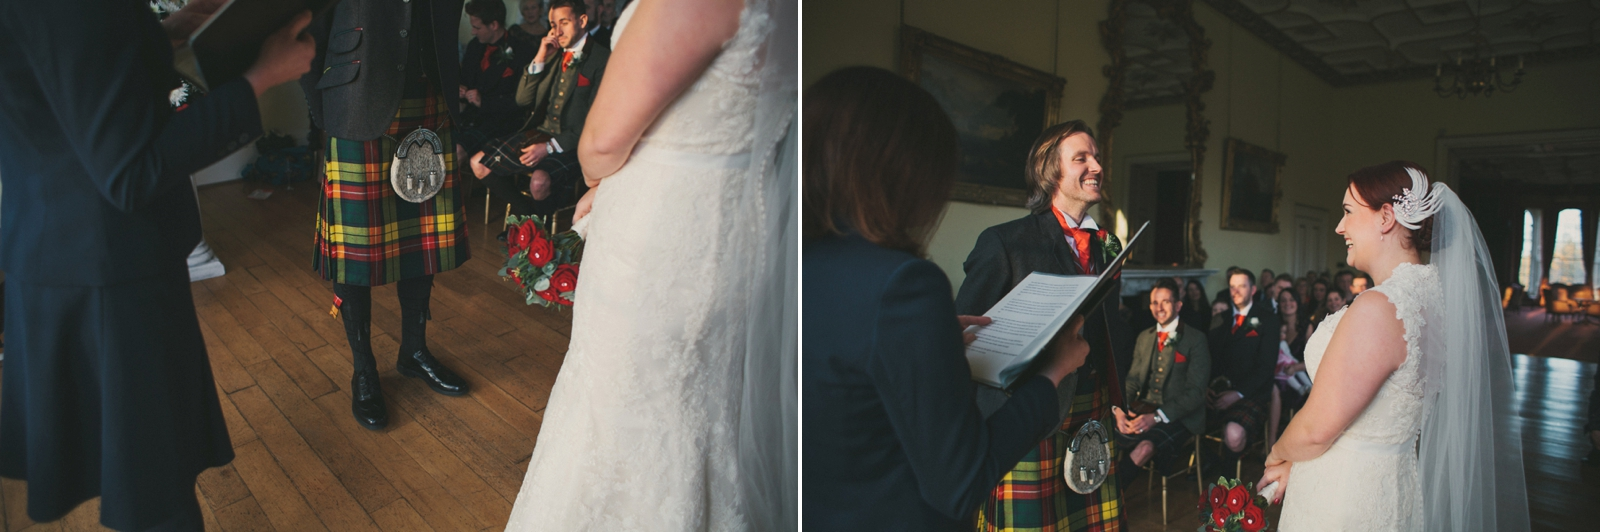 Emma+Ali-Wedding-163.JPG